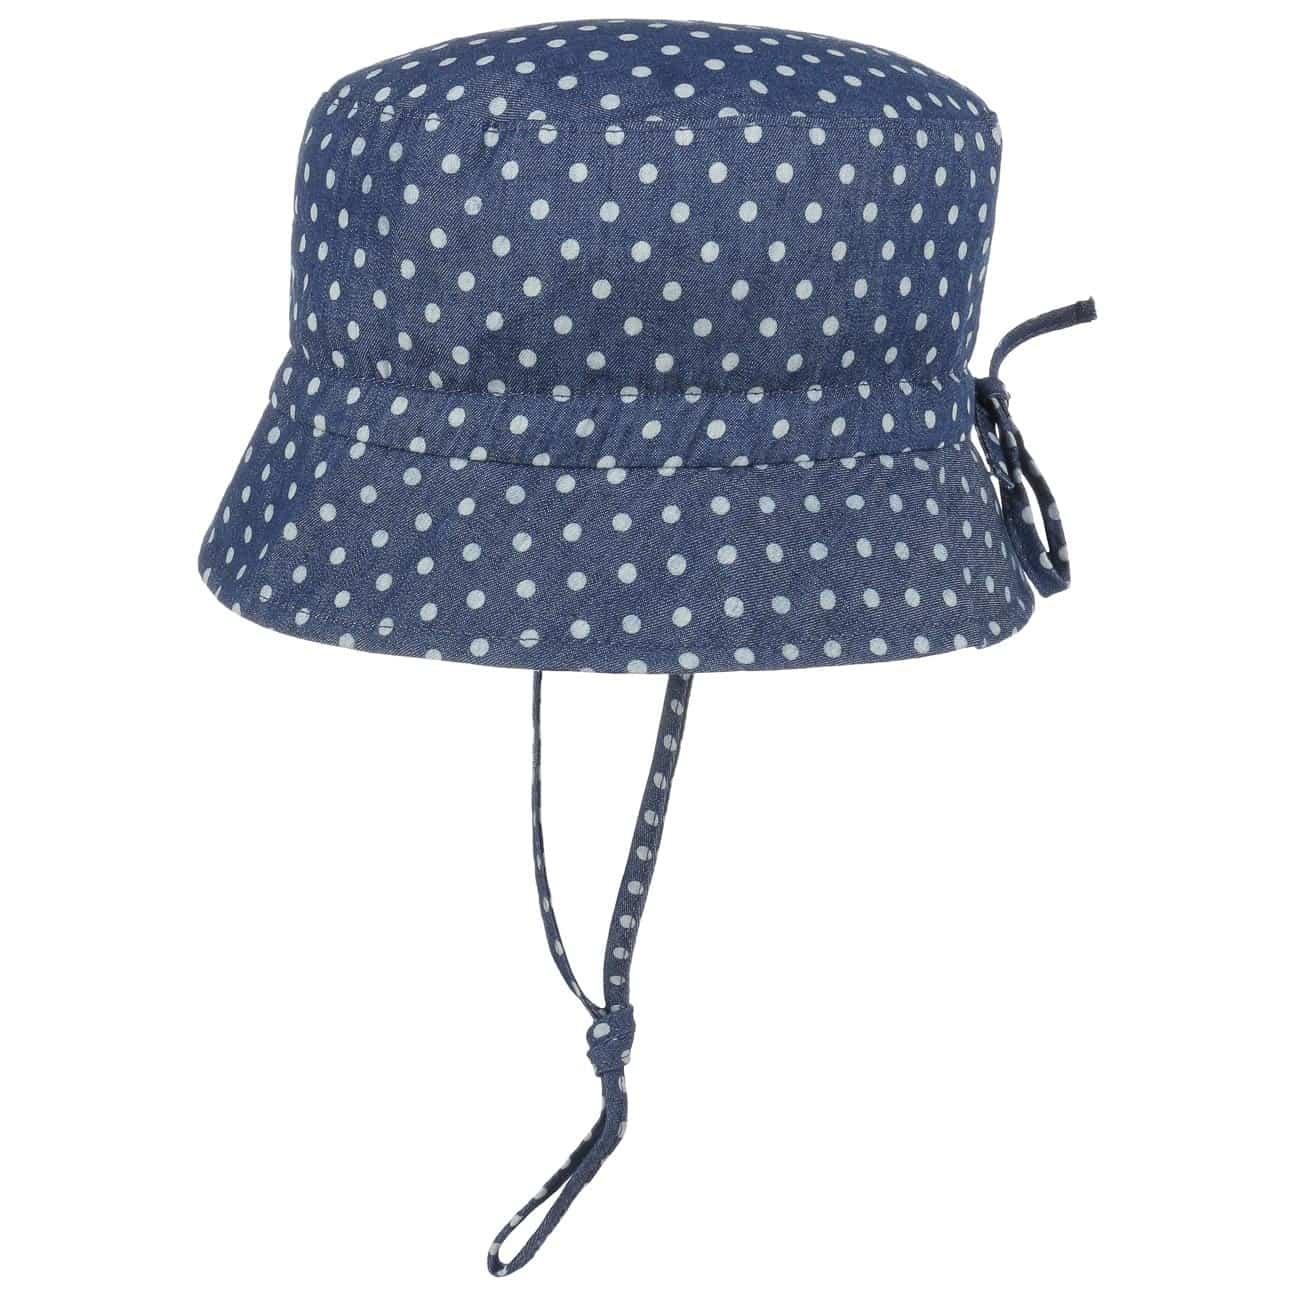 Sombrero de Ni?o Dots Jeans by D?ll  sombrero de pescador